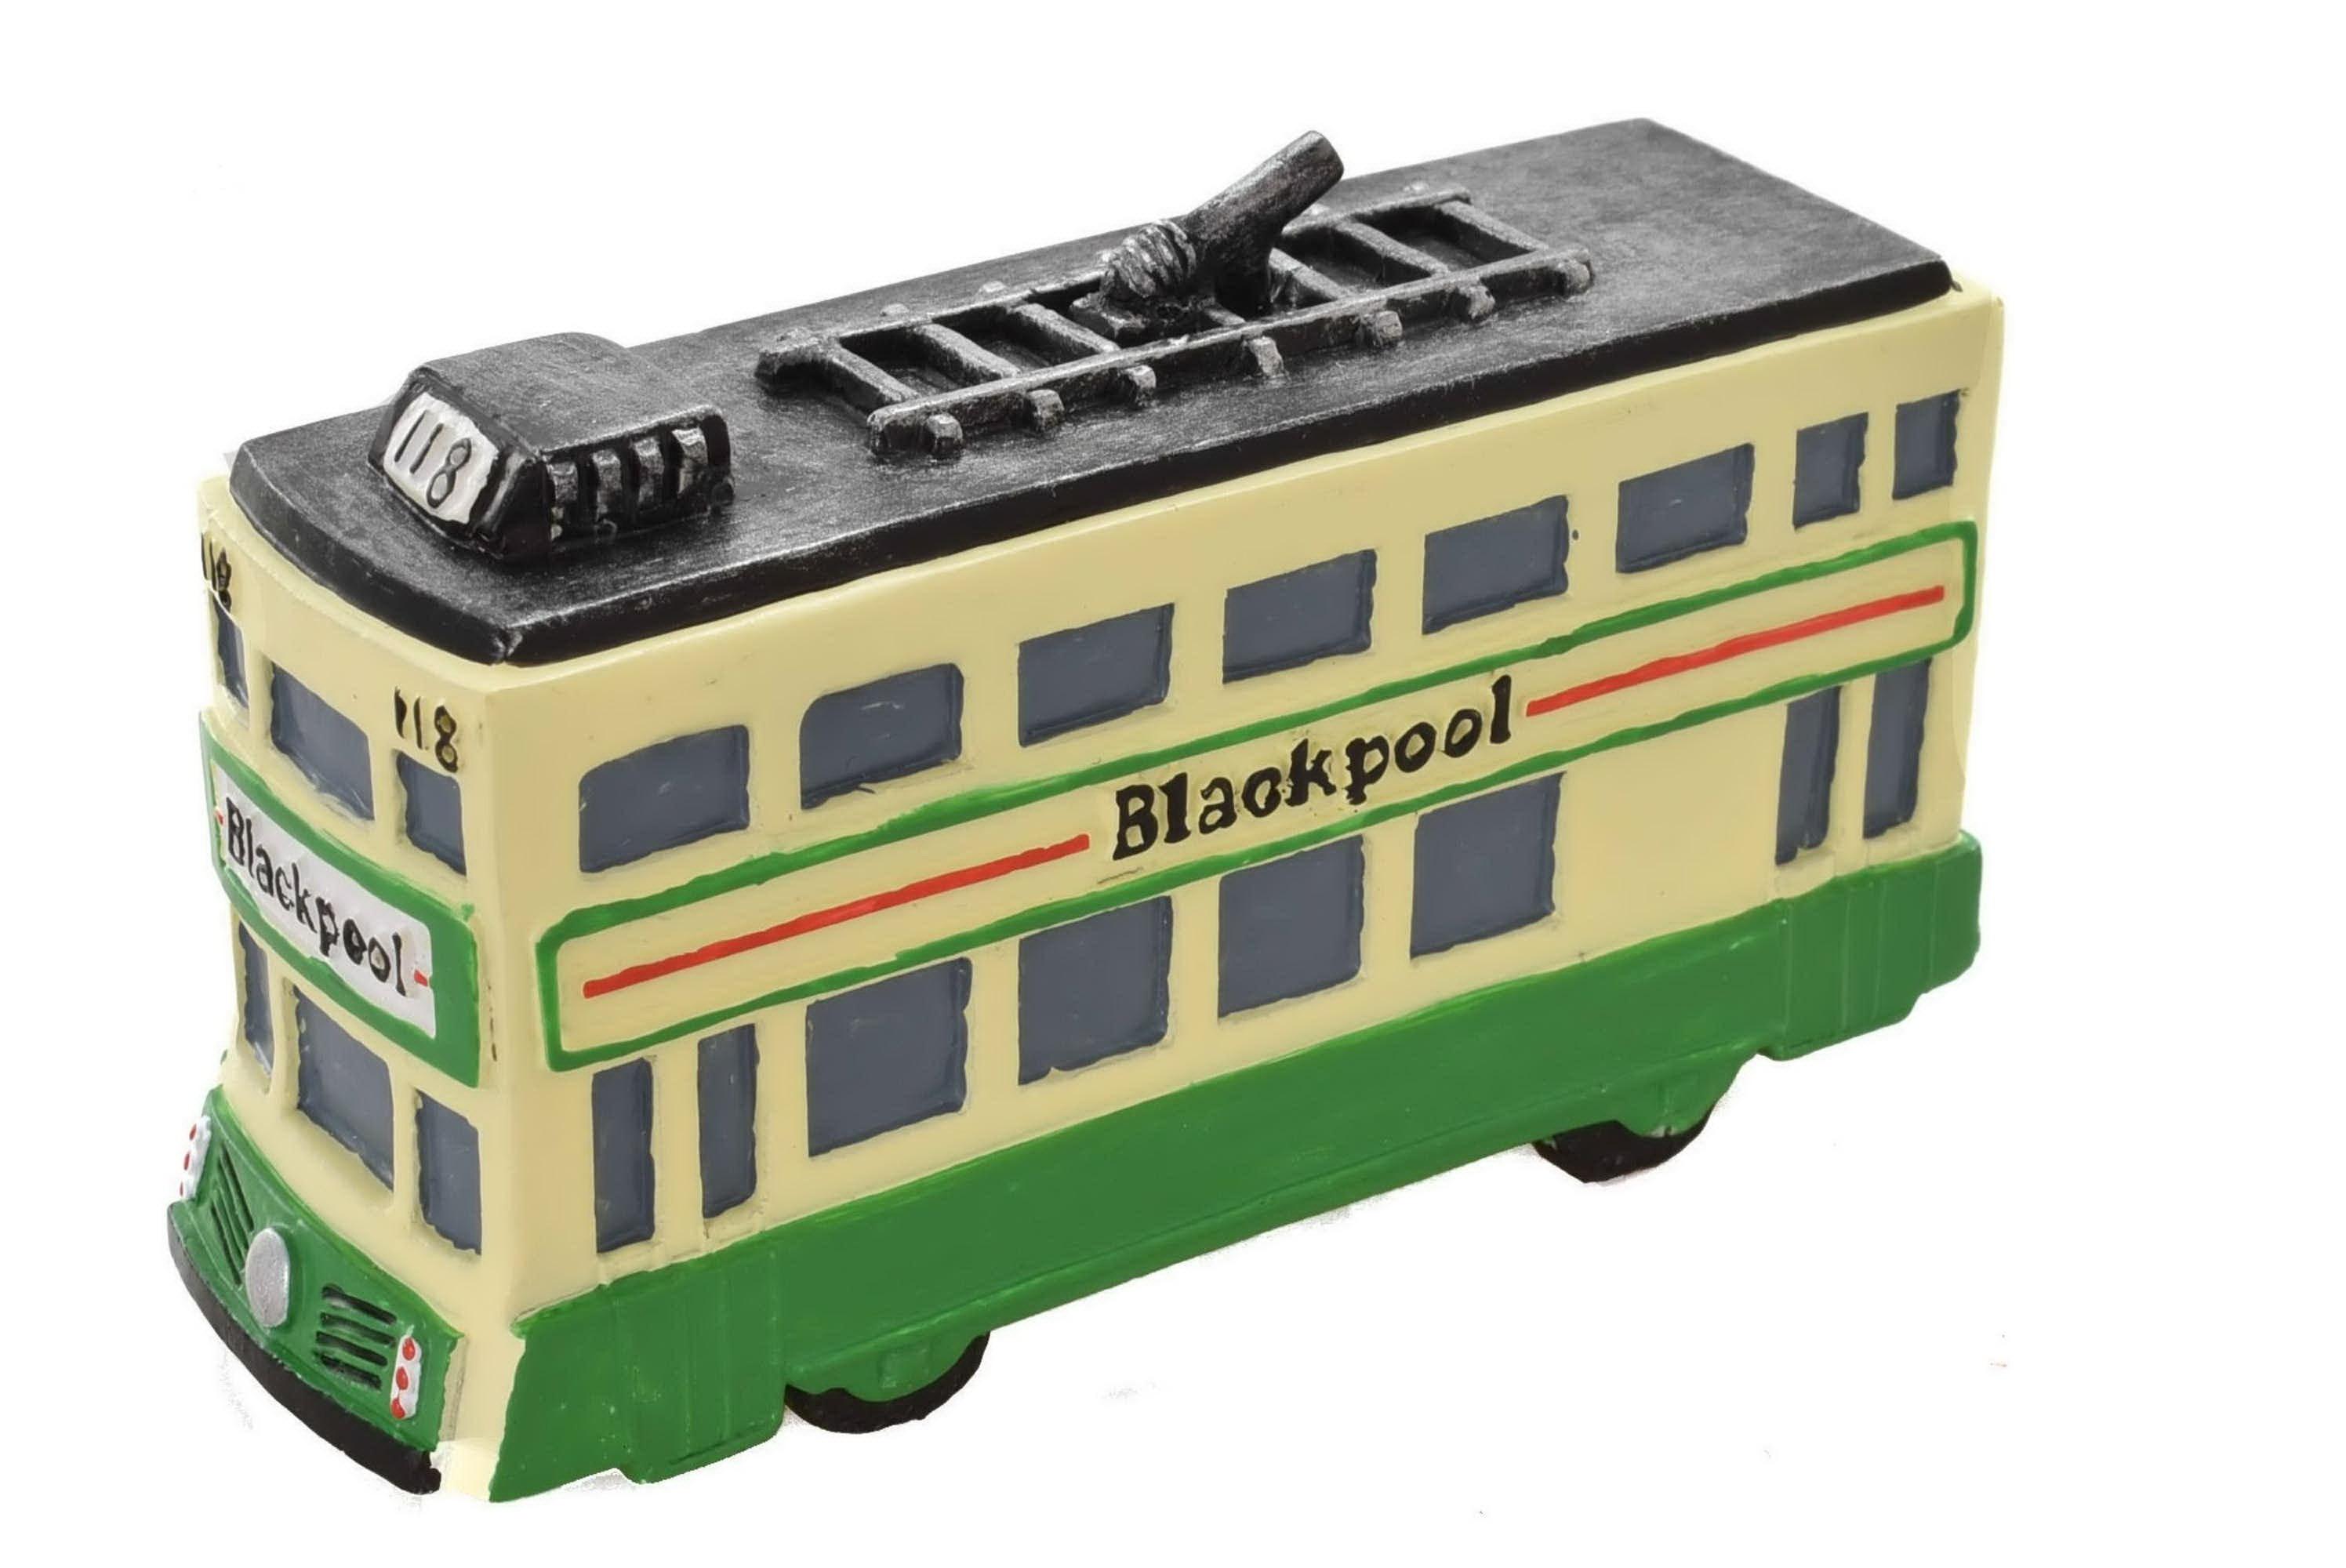 Blackpool Resin Double Decker Tram 10cm